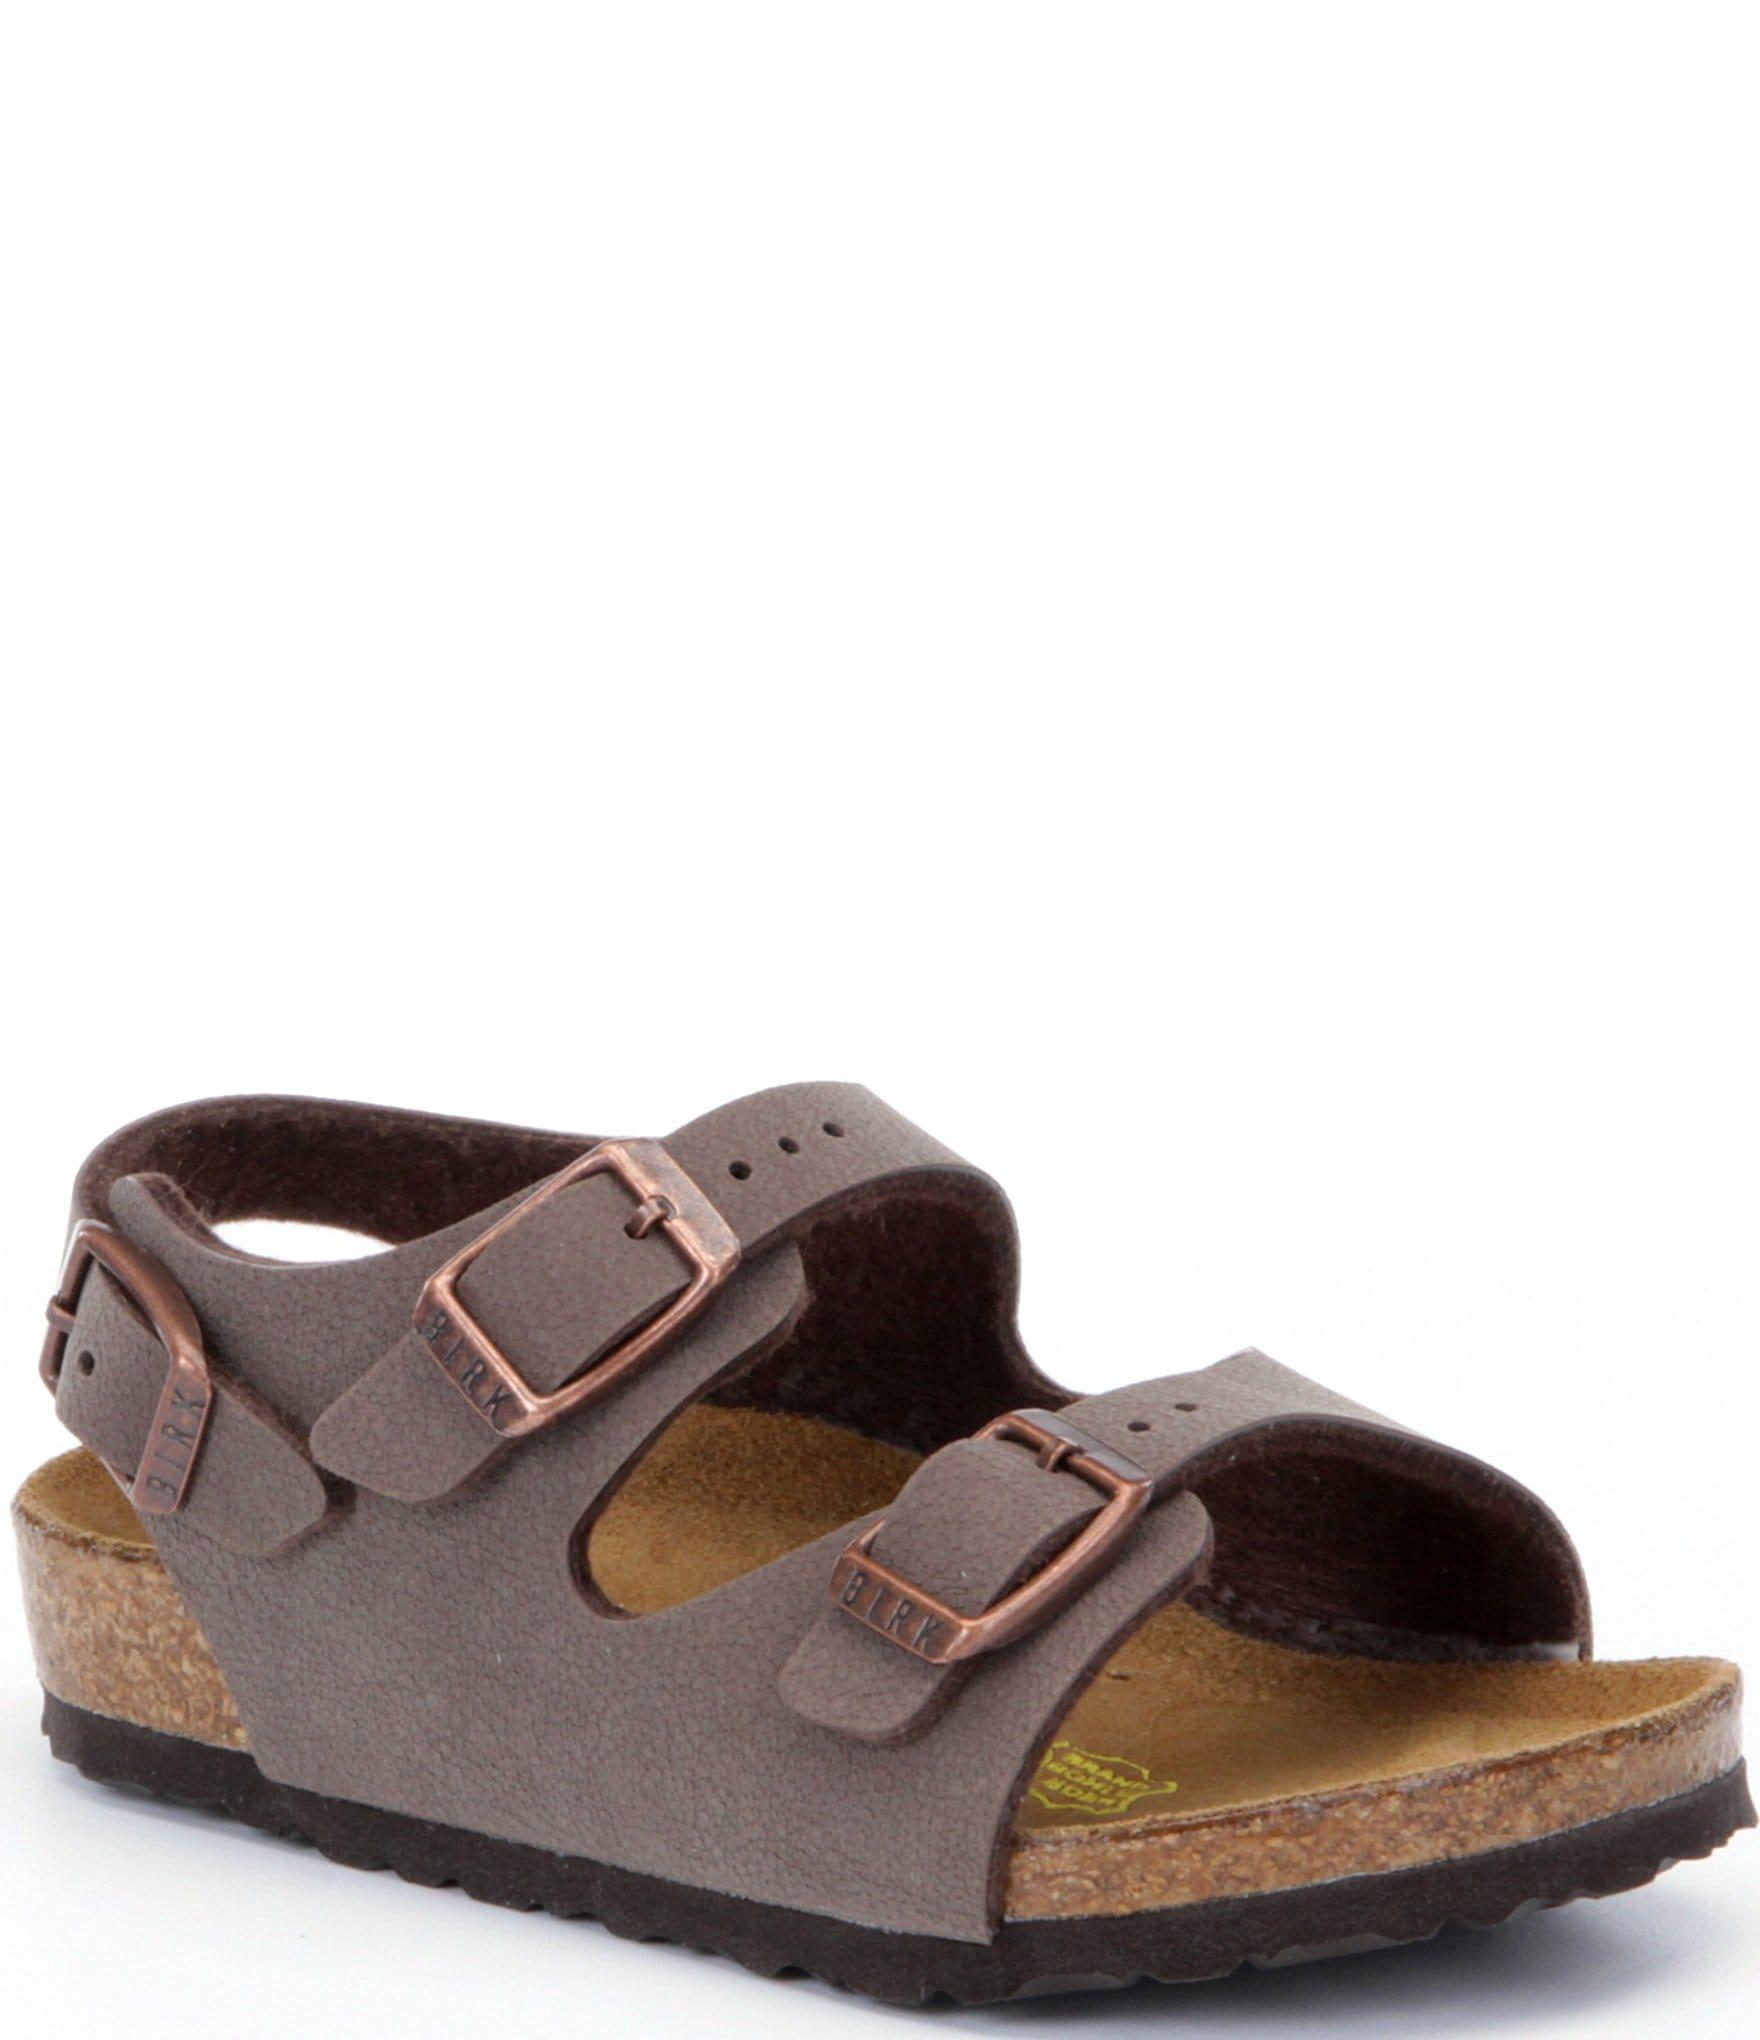 928cc4ef0307 brown sandals  Kids  Shoes